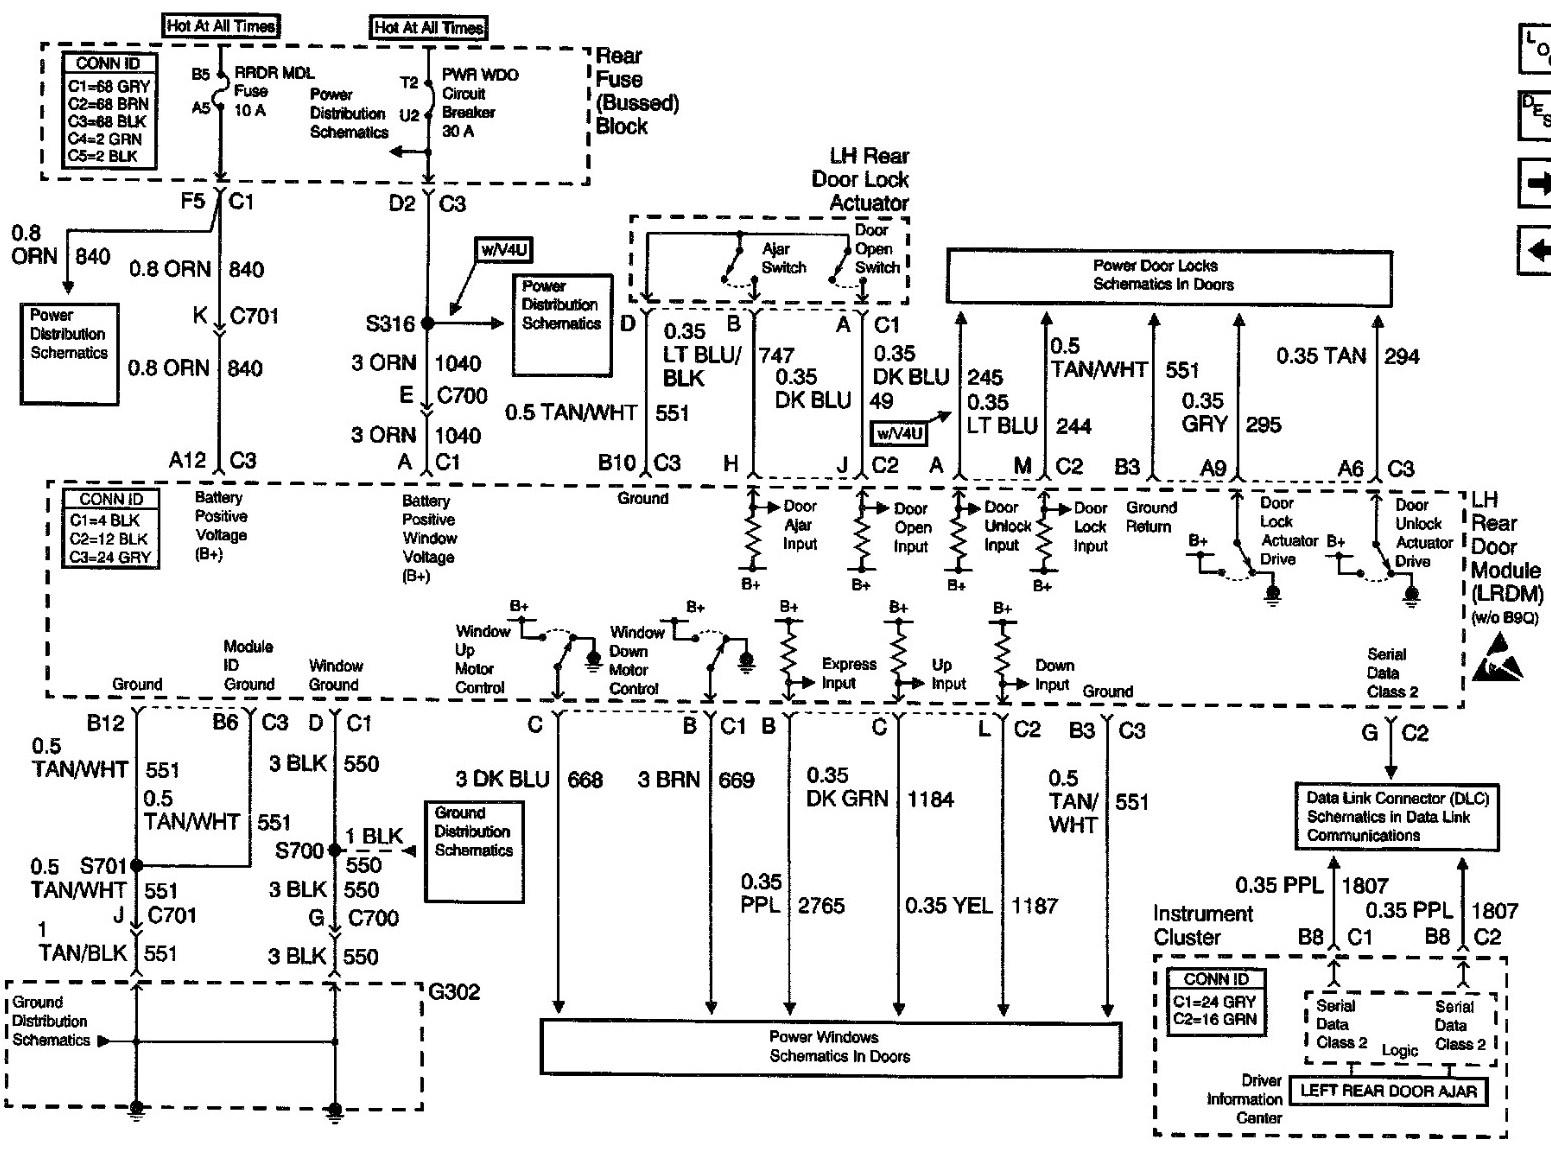 [SCHEMATICS_4LK]  YM_7790] Cadillac Cts Radio Wiring Harness Free Diagram | 2007 Cts Wiring Diagram |  | Coun Stap Zidur Inki Anist Unre Sarc Hison Monoc Waro Isop Comin Exmet Wned  Vira Tixat Mohammedshrine Librar Wiring 101